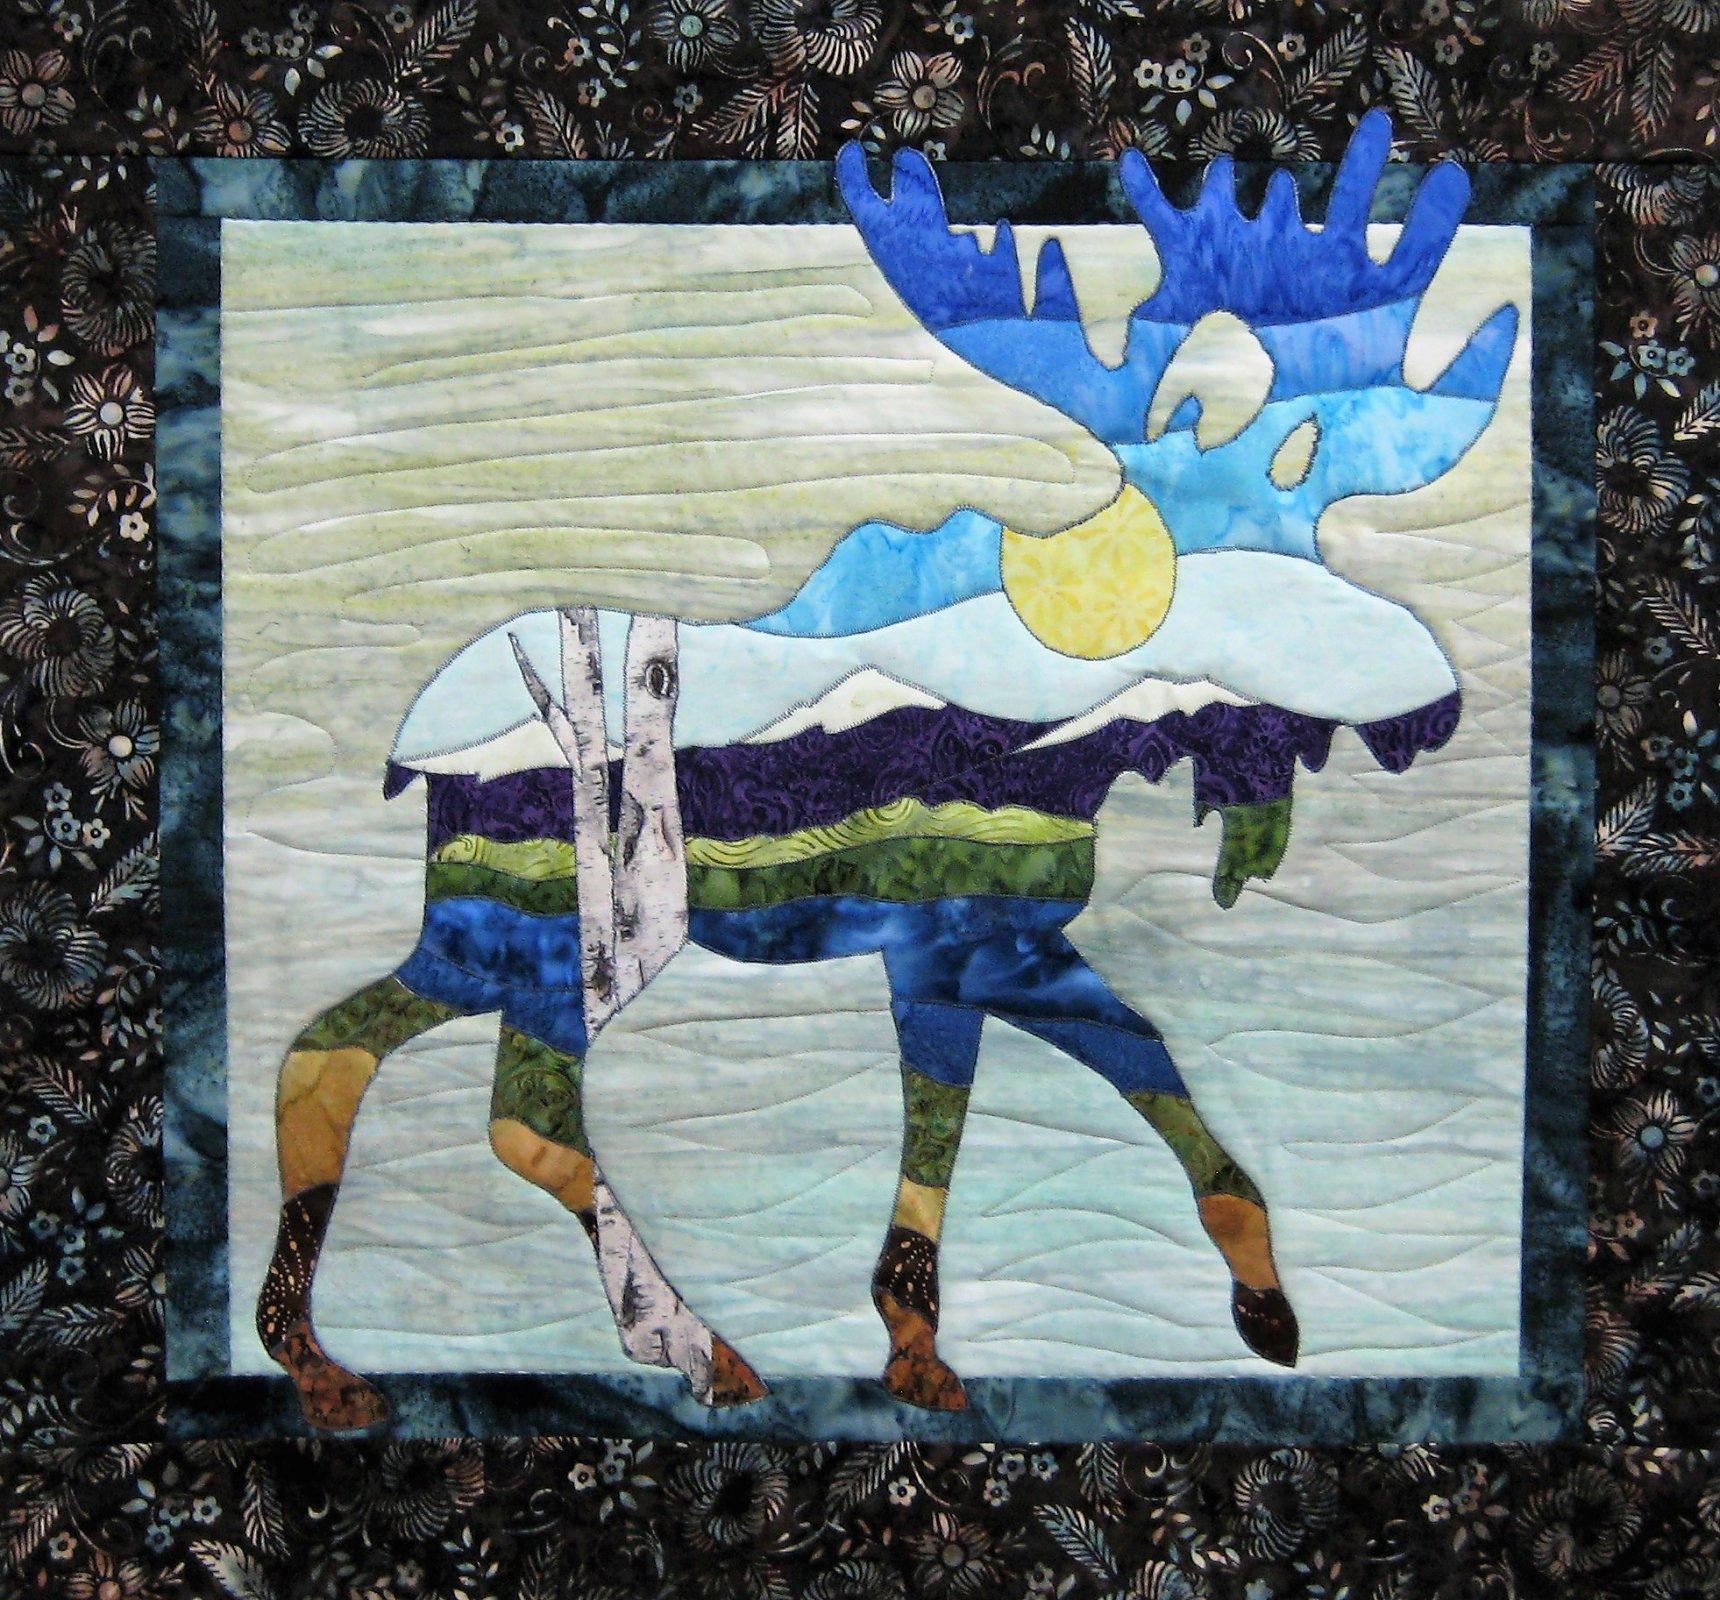 Moose on the Loose! Kit